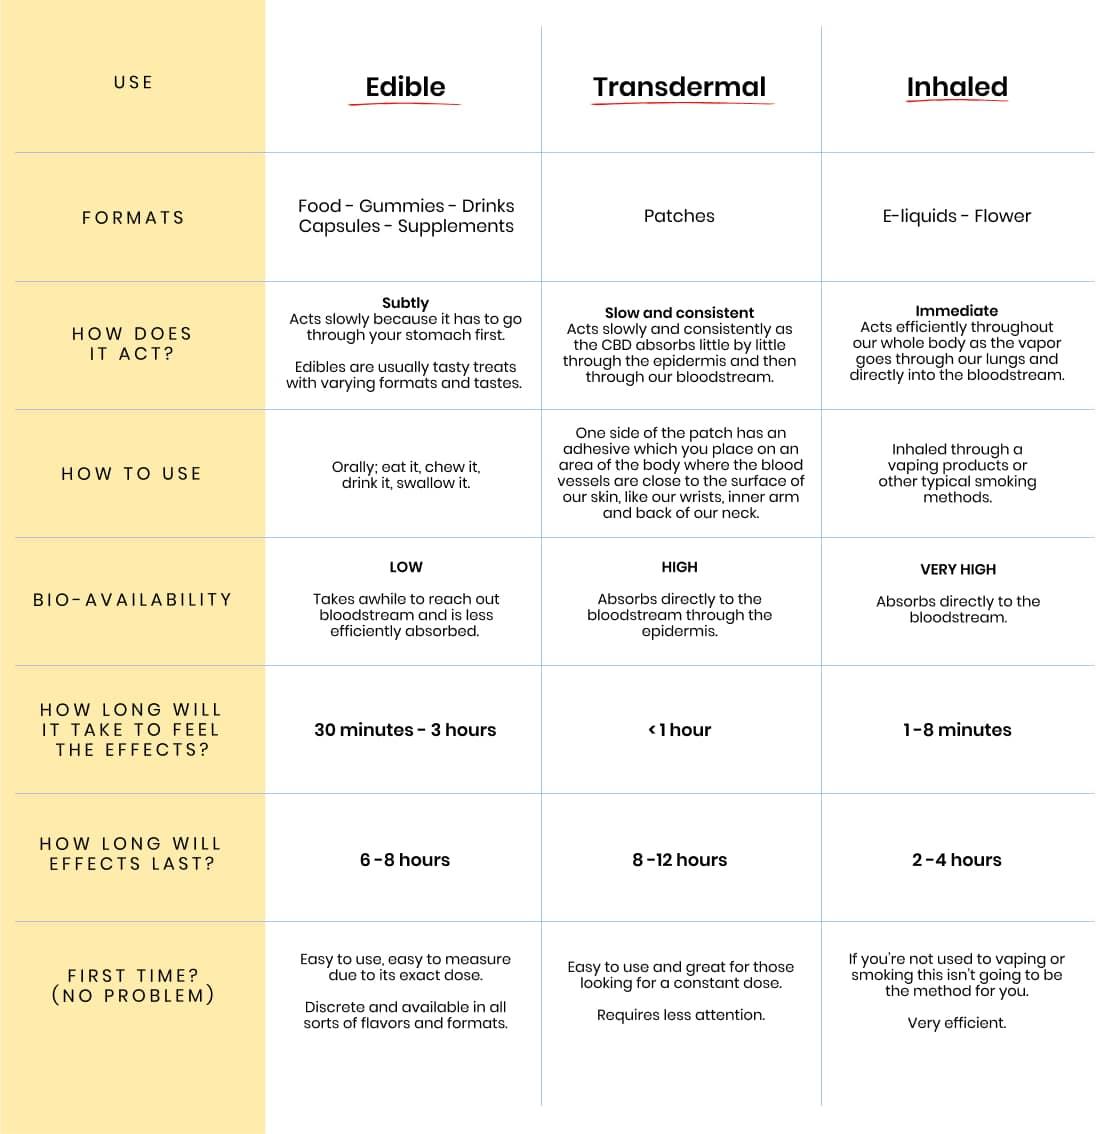 GRAPHIC_ Edible use vs. Transdermal use vs. Inhaled use